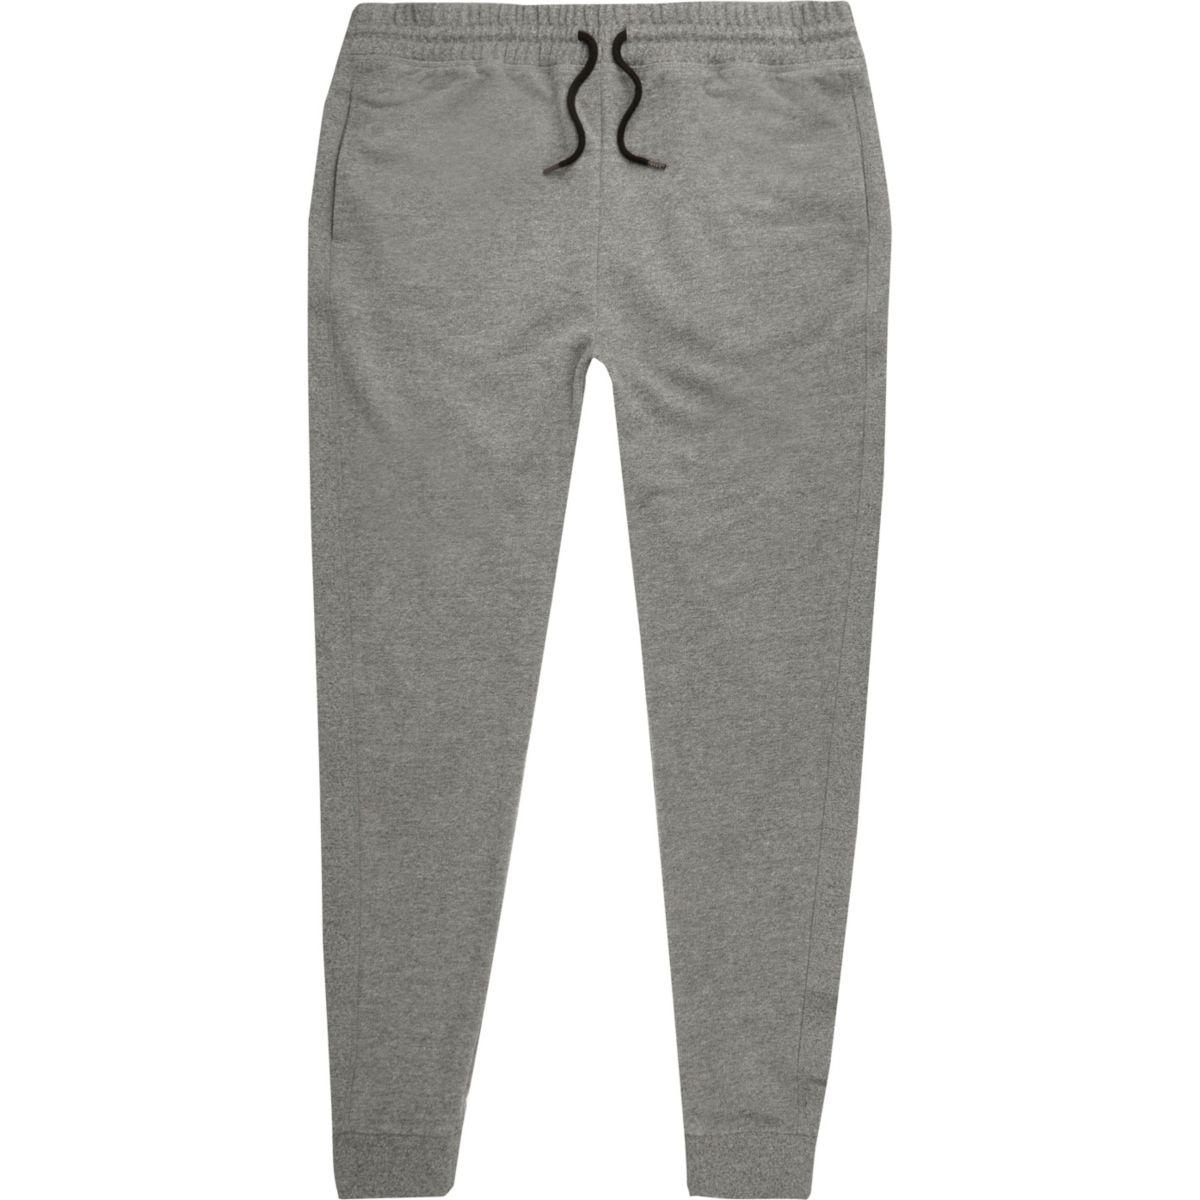 Grey jersey joggers